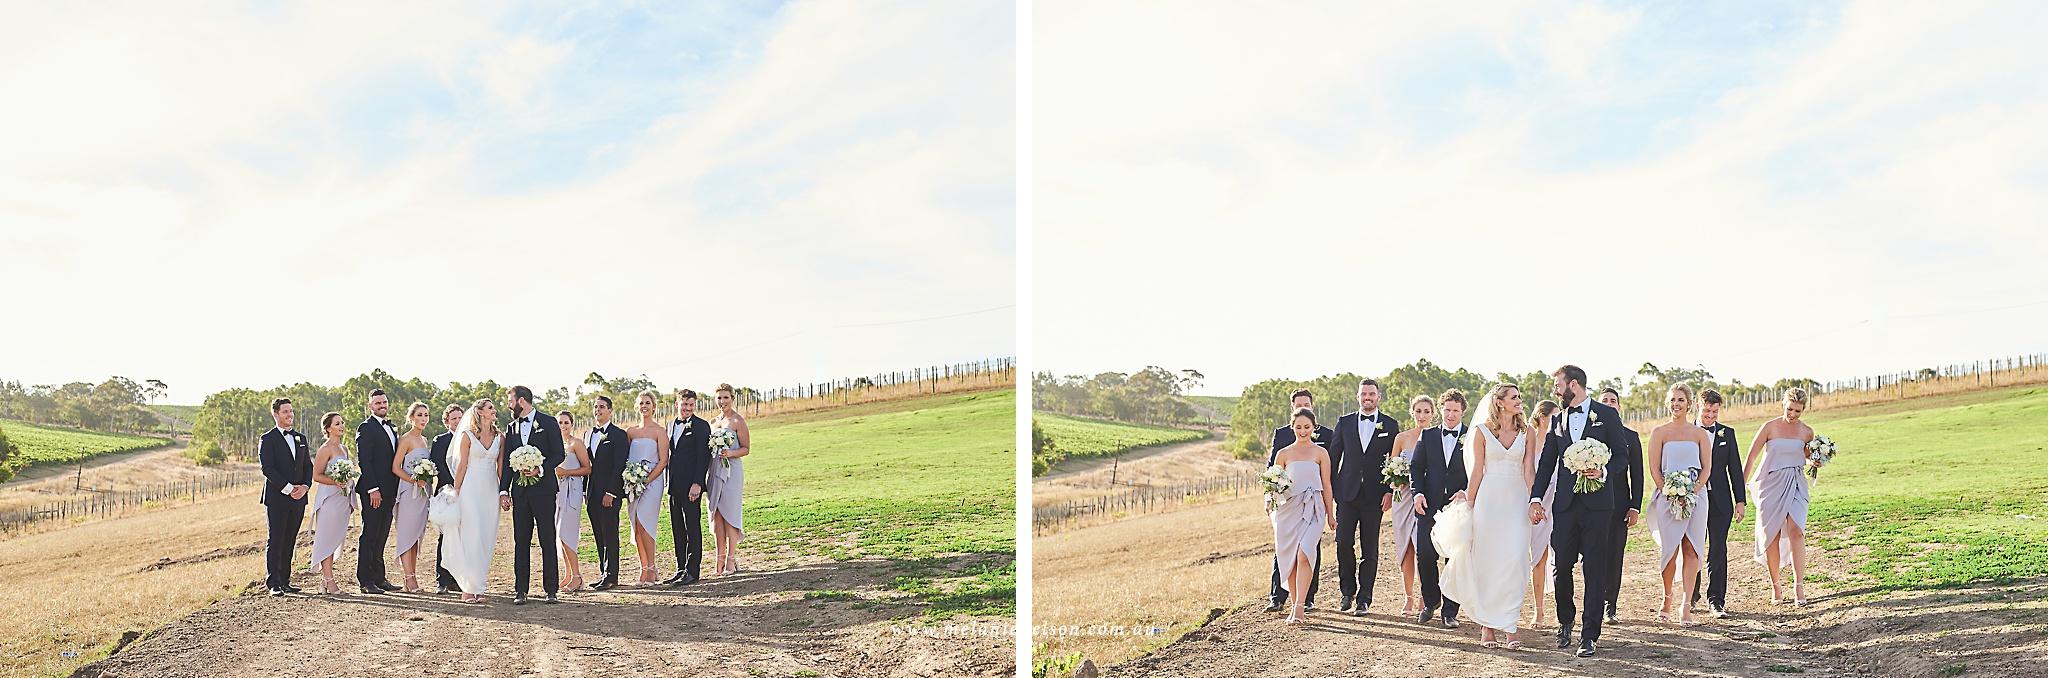 longview_vineyard_wedding_0055.jpg